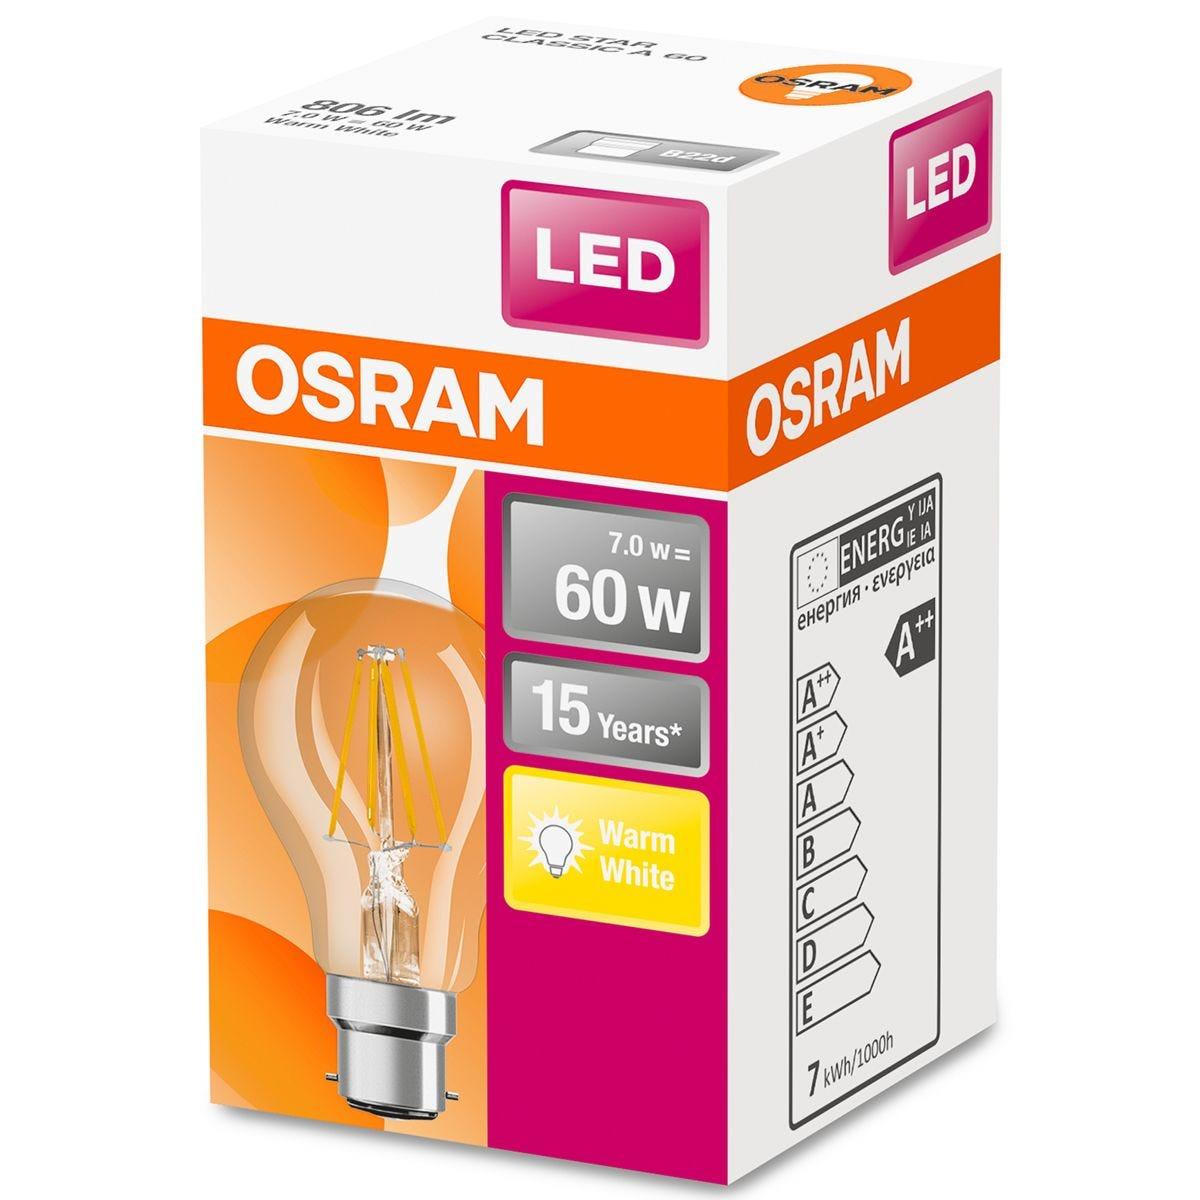 Osram Classic A 60W LED Filament Clear BC Bulb - Warm White